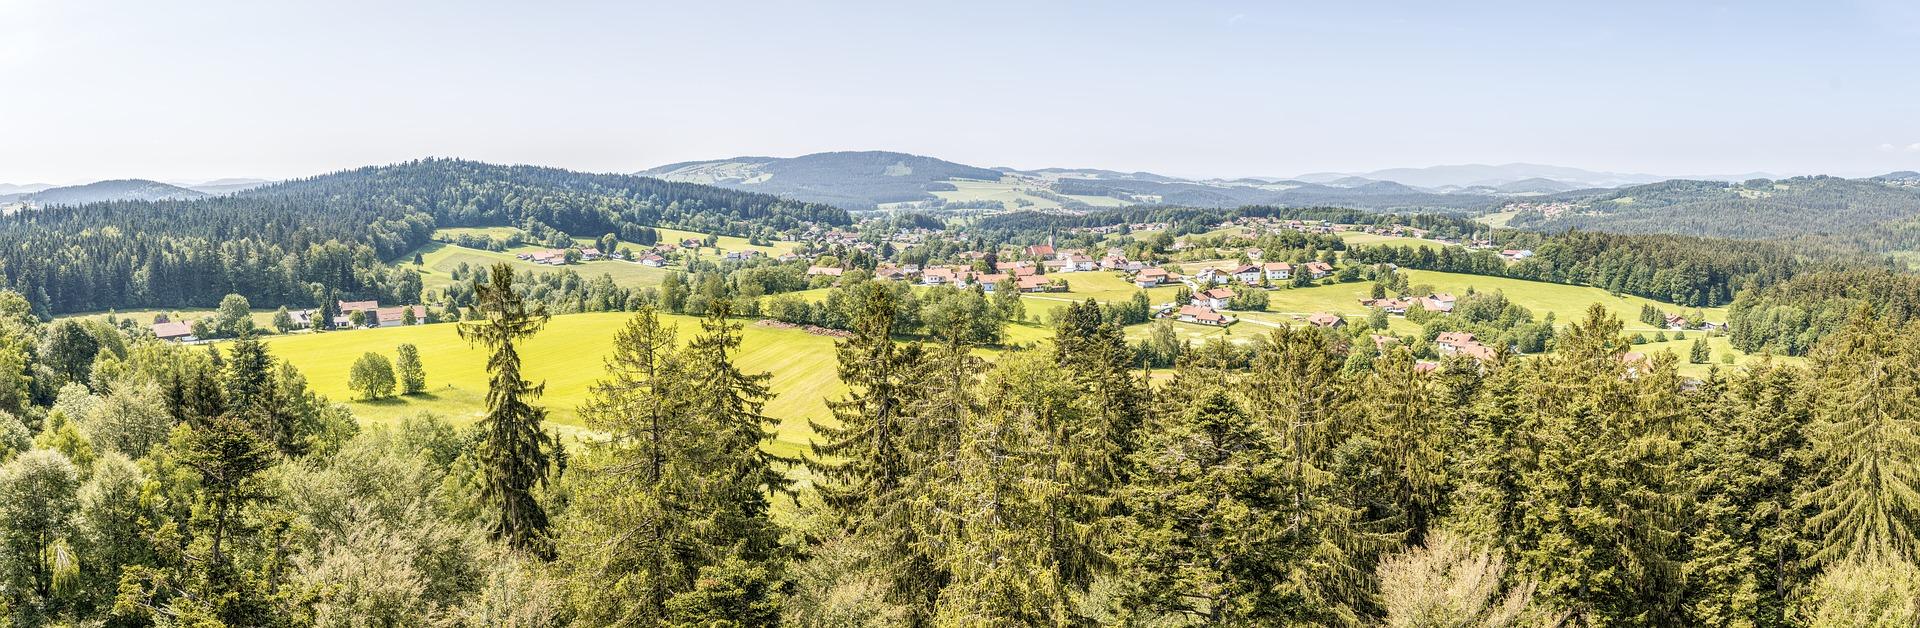 Bärenpfad Grafenau - Neuschönau